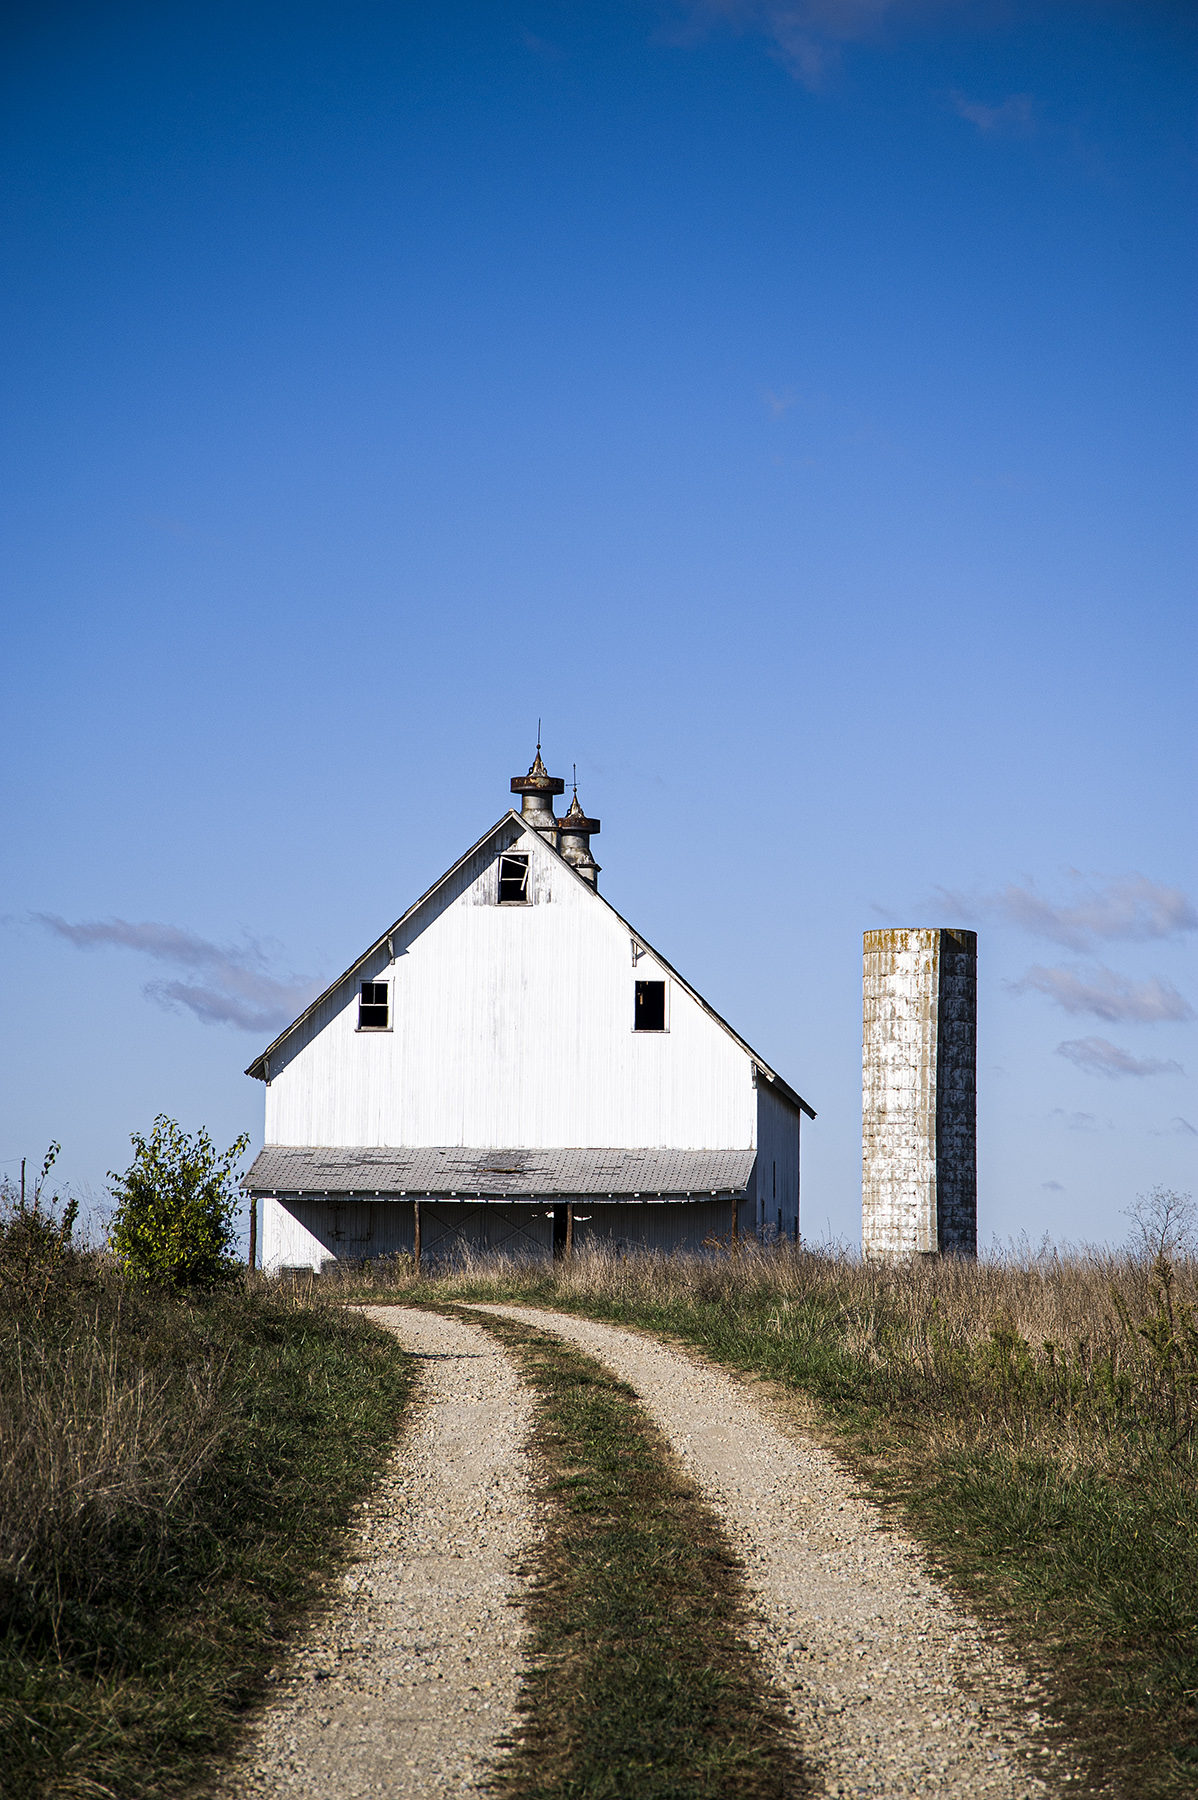 Barn-and-Silo